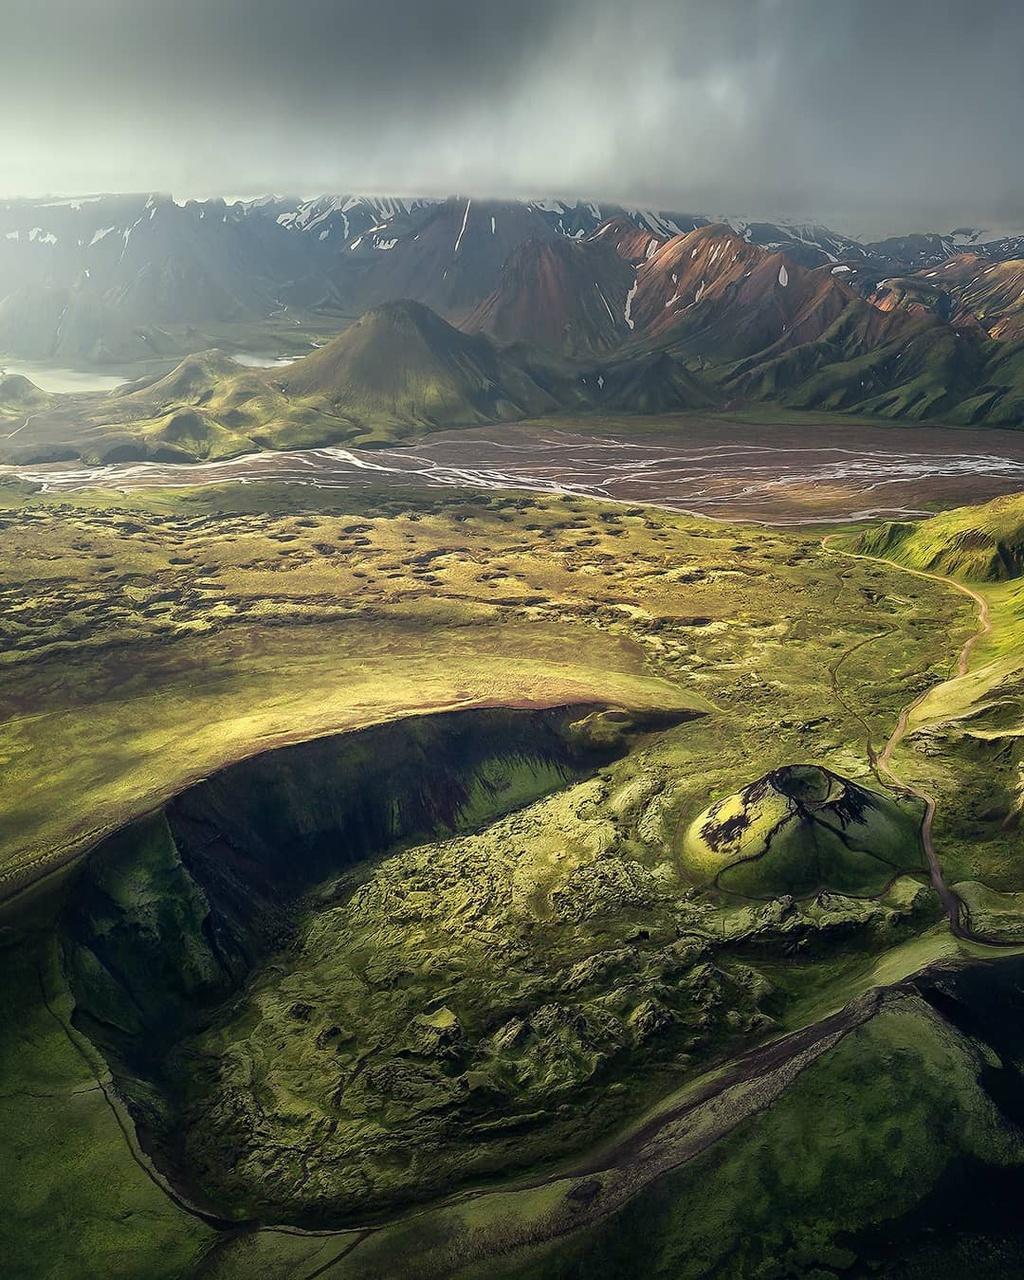 nhung-mien-dat-mau-xanh-o-Iceland-ivivu-9